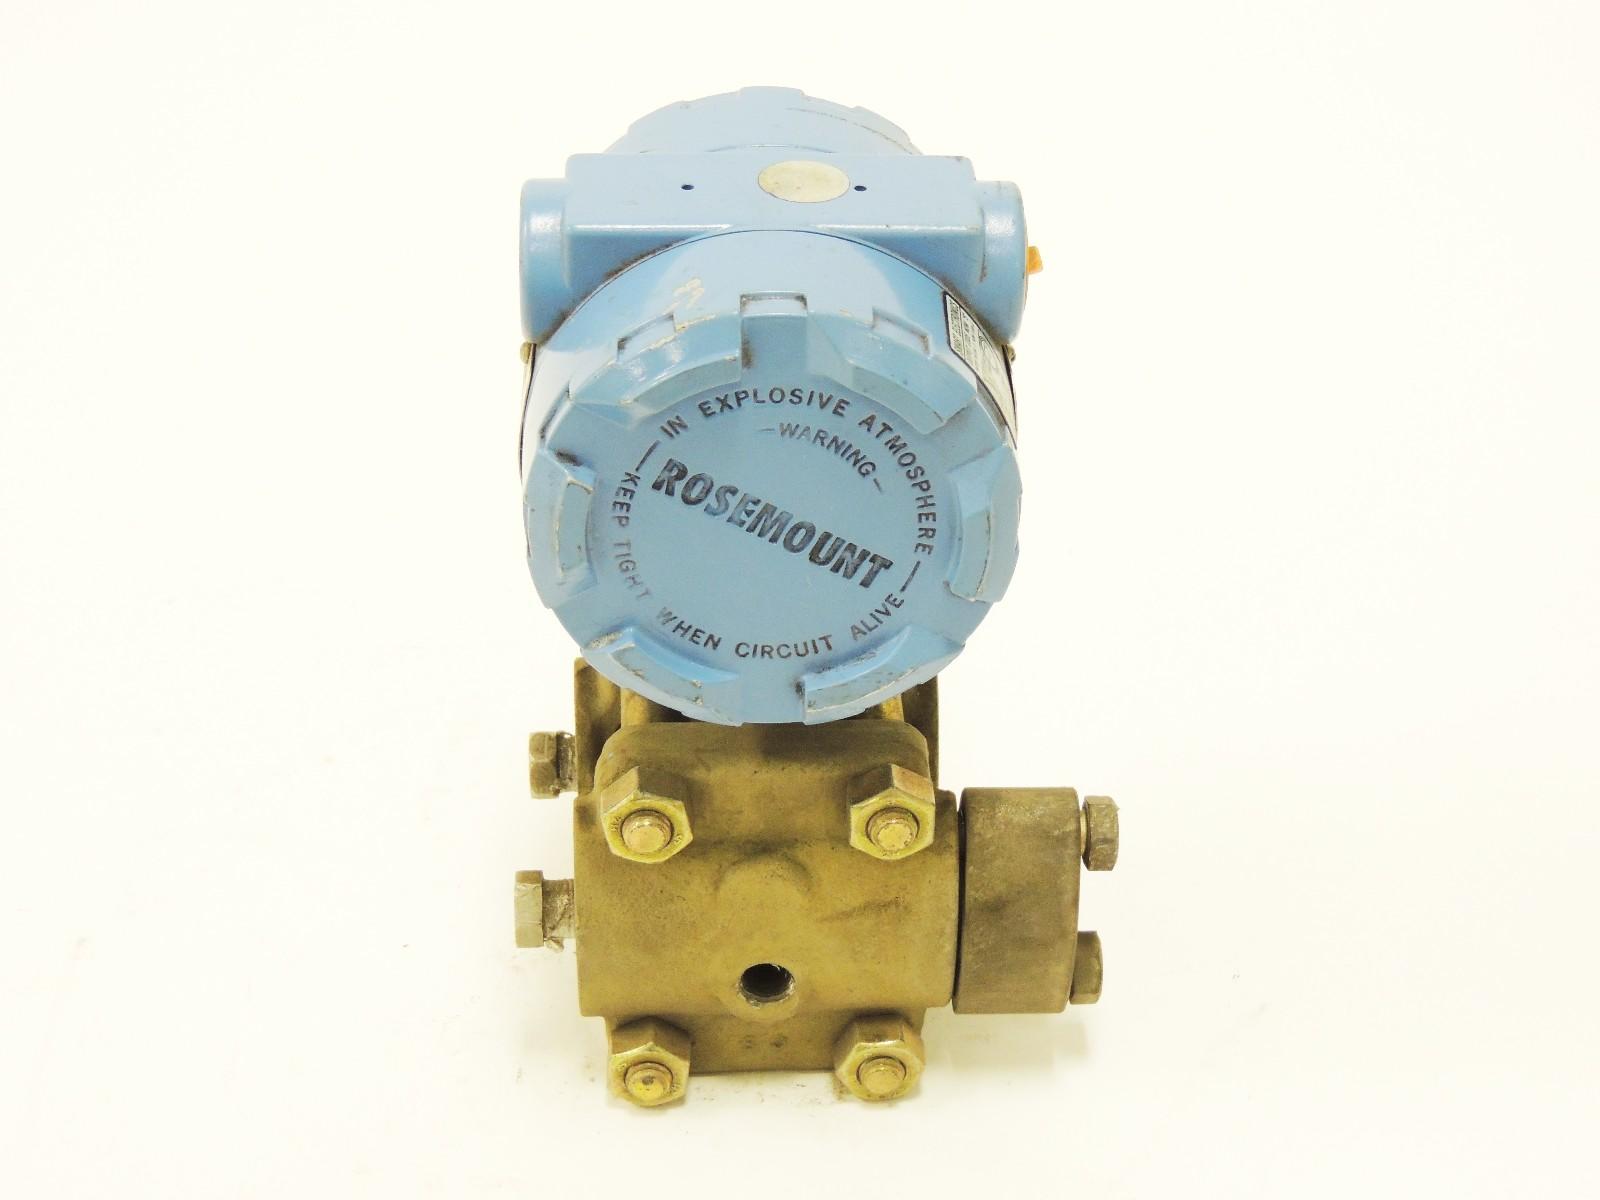 rosemount pressure transmitter wiring diagram 02 chevy silverado radio used 1151dp4512dfd2 45 vdc